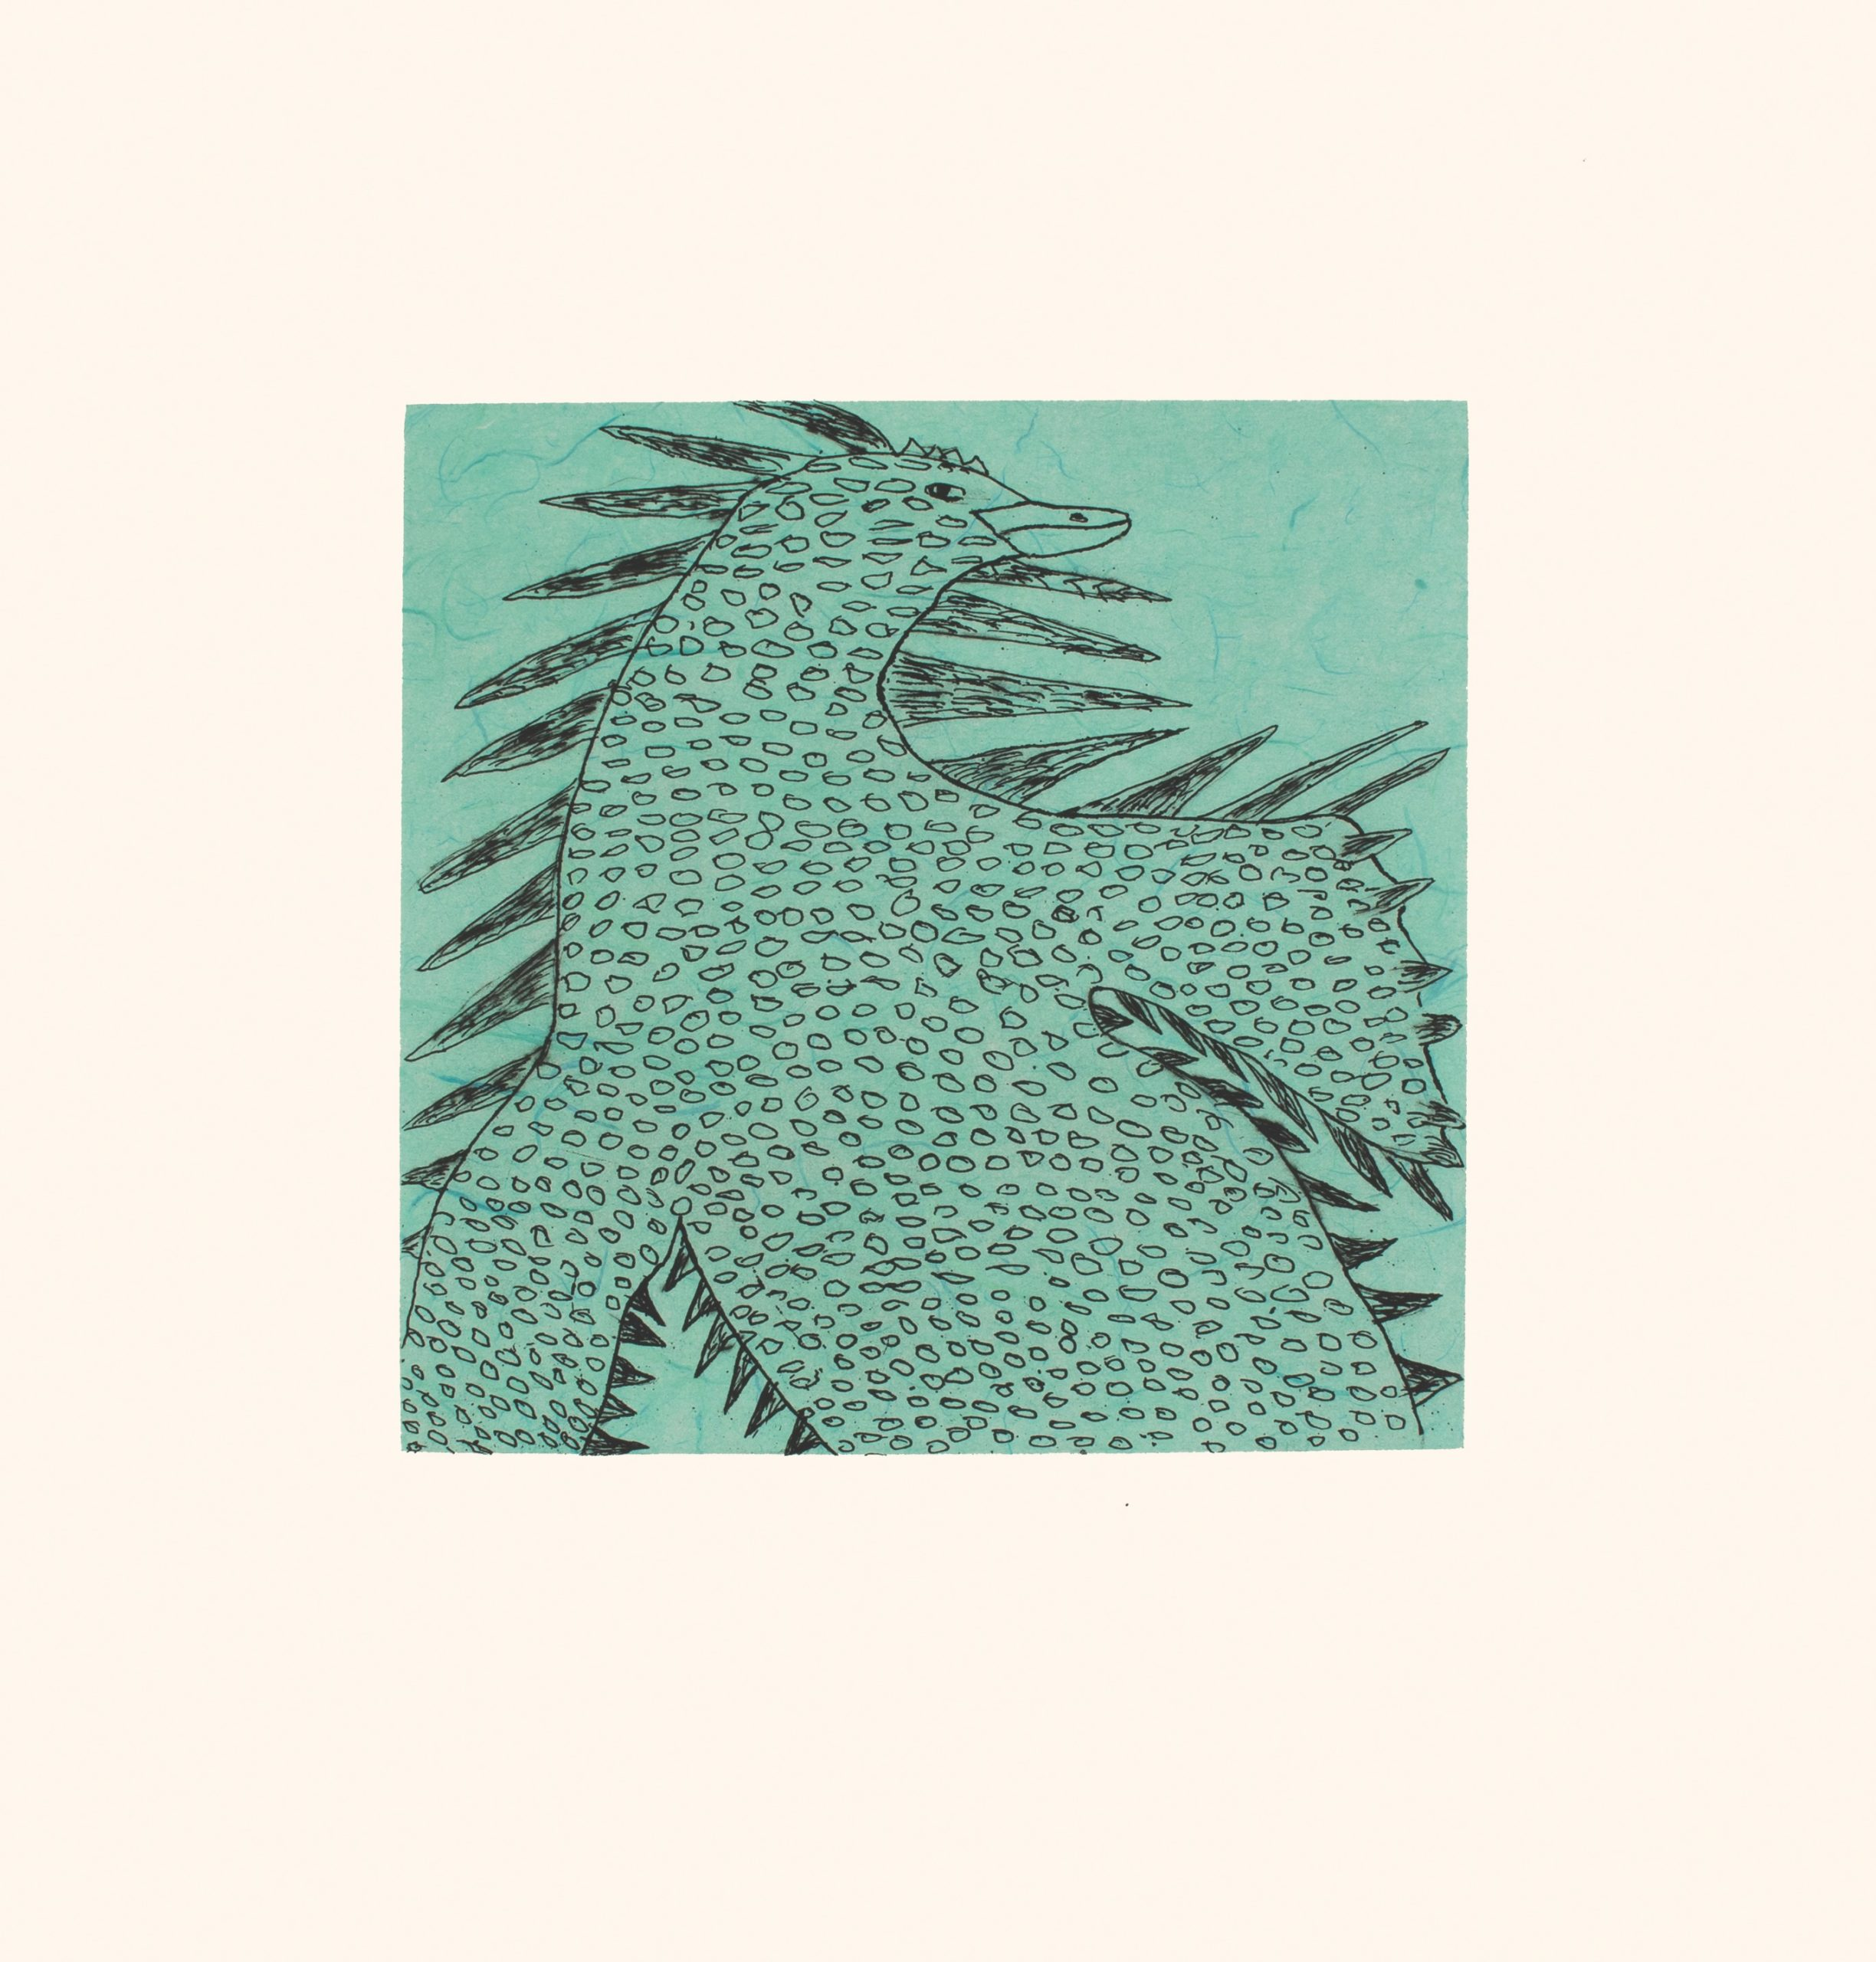 Nuna Parr - Shoreline Spirit